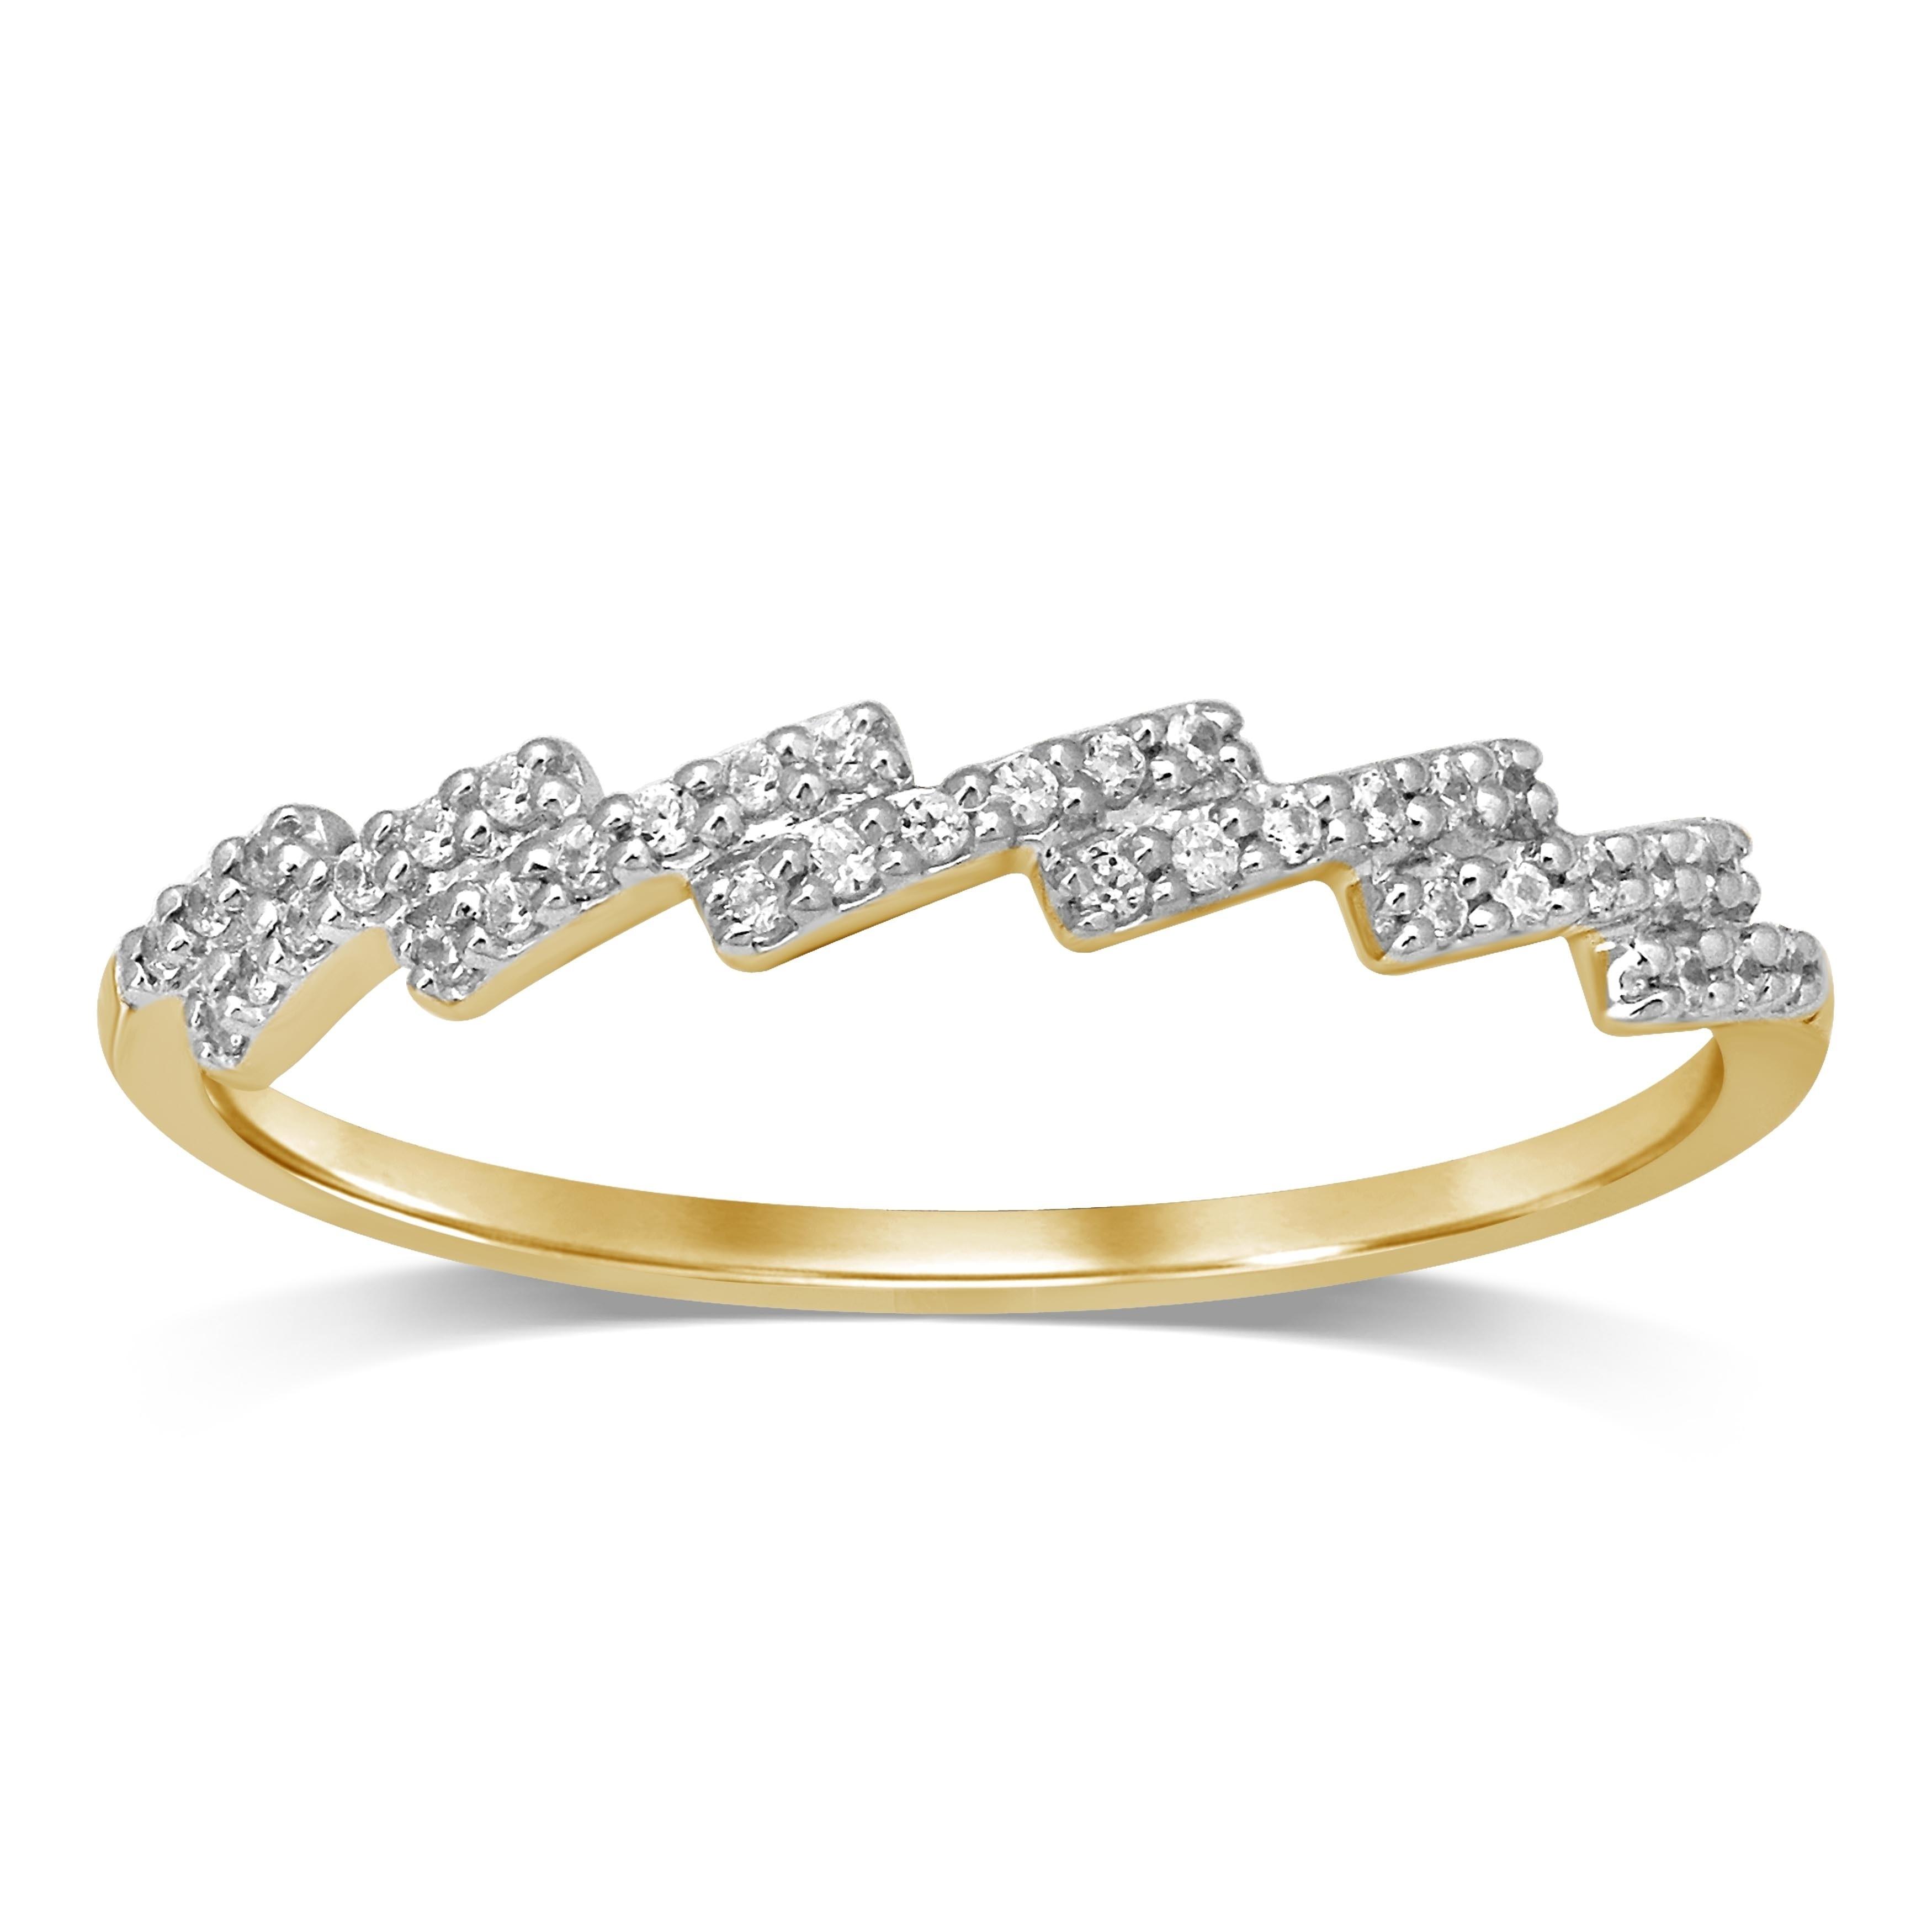 G-H,I2-I3 1//5 cttw, Diamond Wedding Band in 10K White Gold Size-11